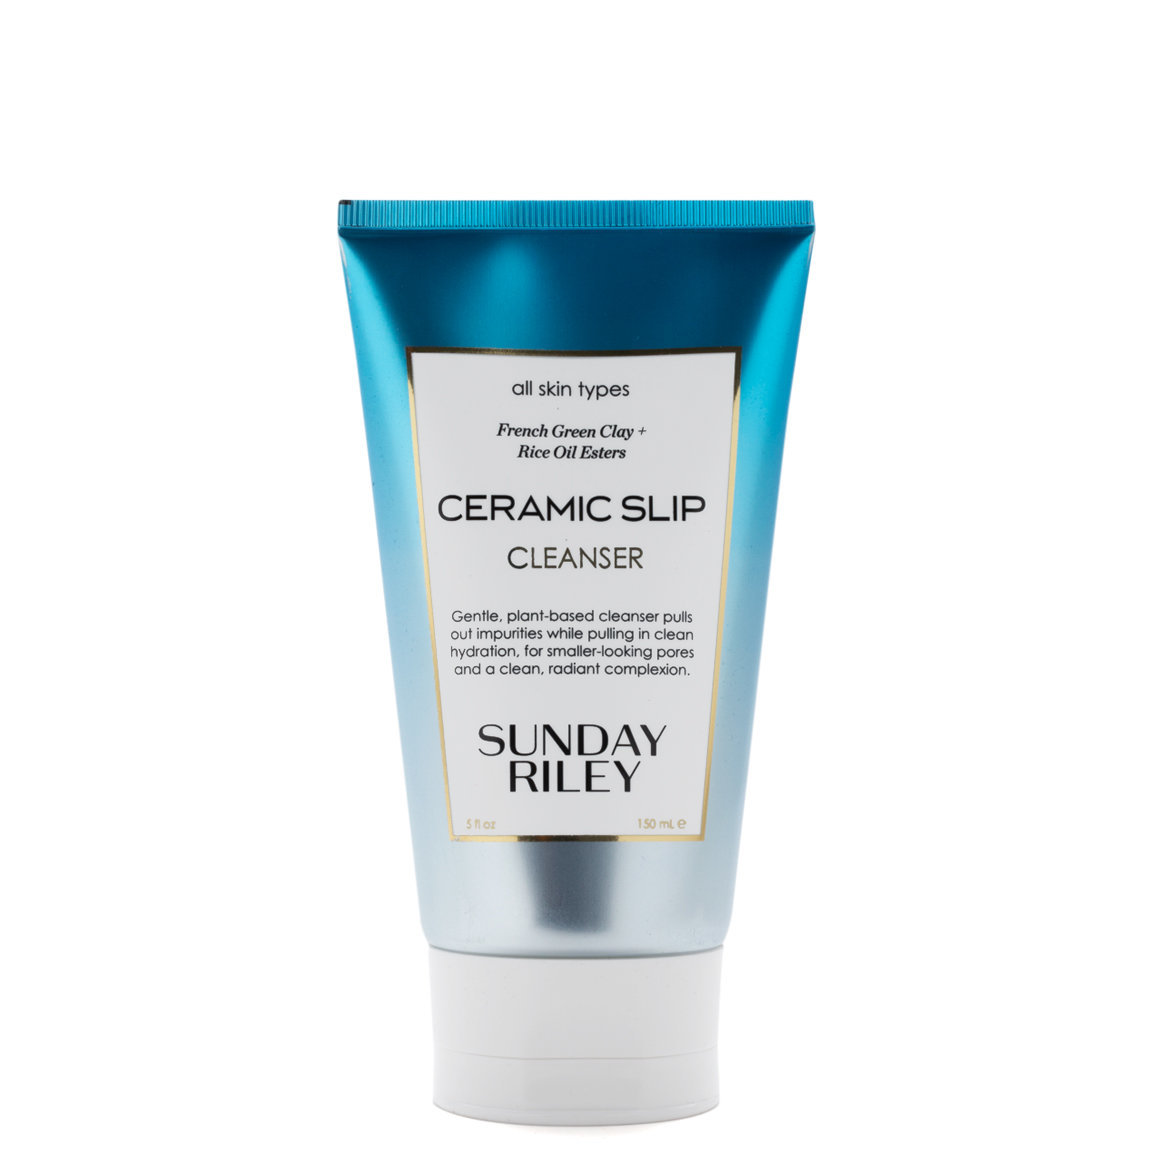 SUNDAY RILEY - Ceramic Slip Cleanser £26